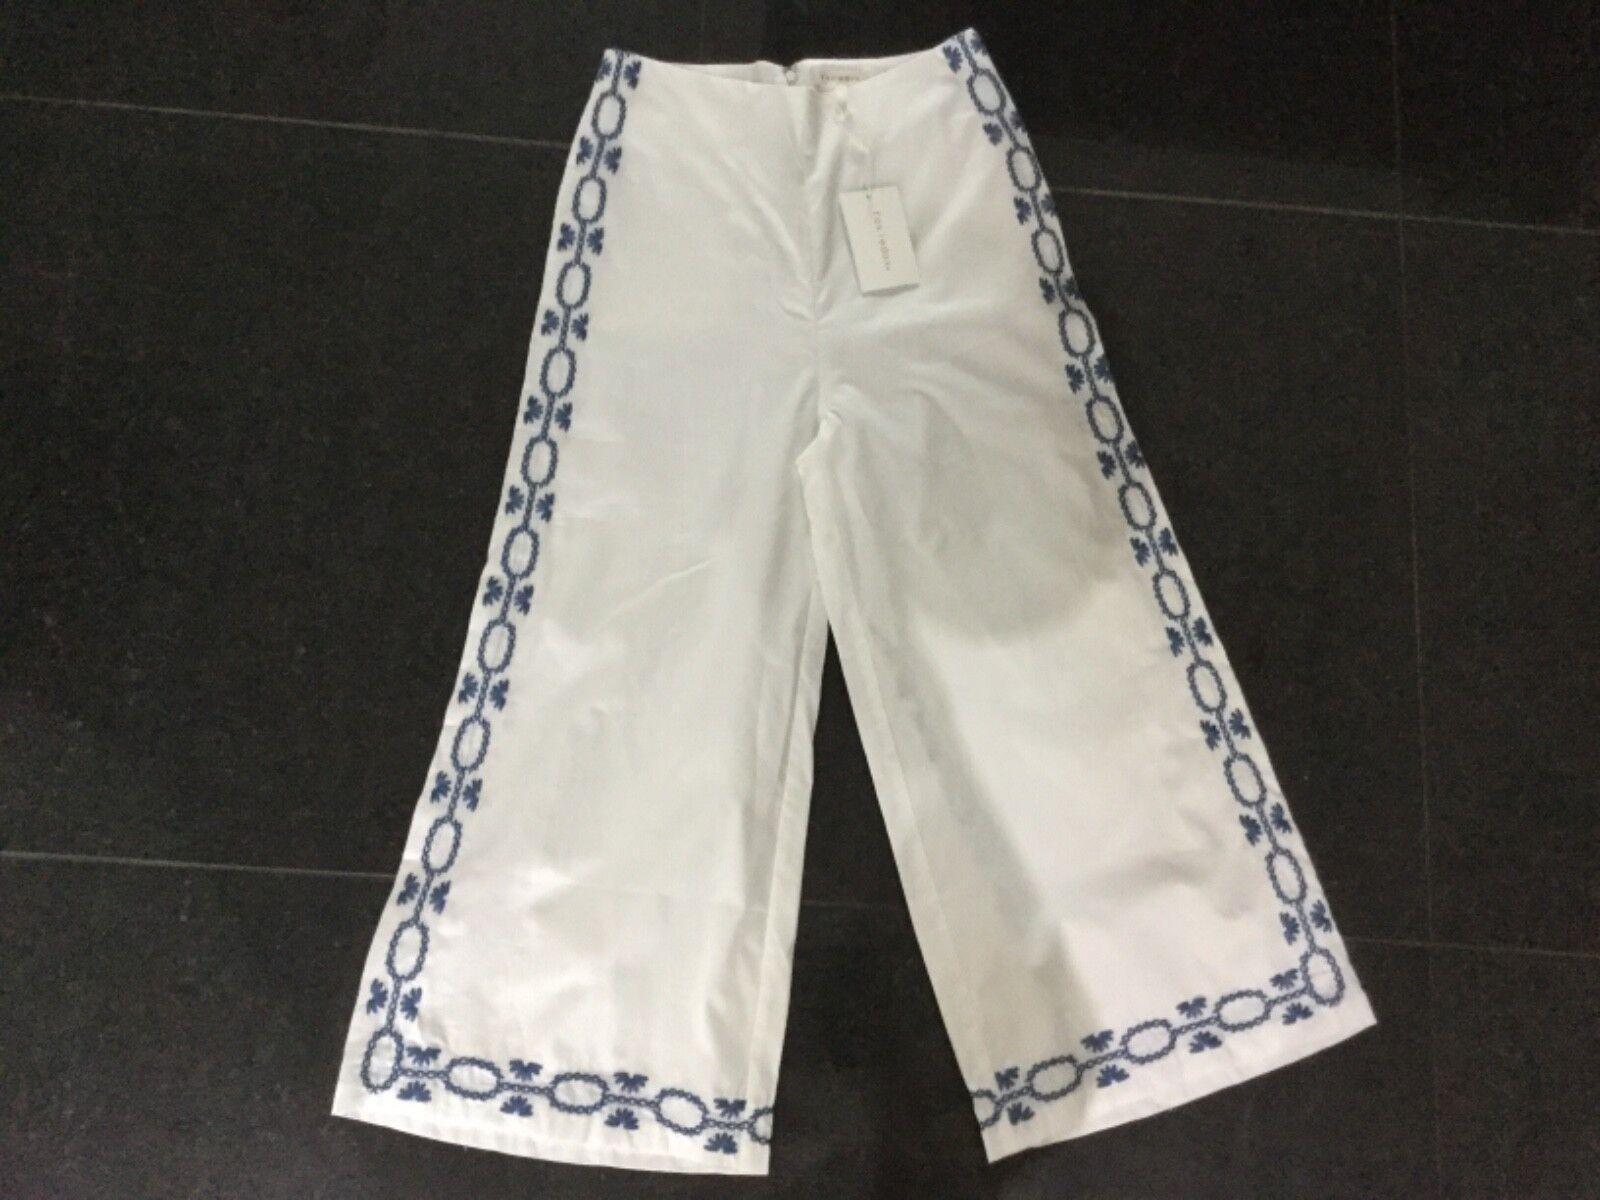 NWT Foxiedox New & Gen. Ladies White Cotton Crop Trousers Size Medium